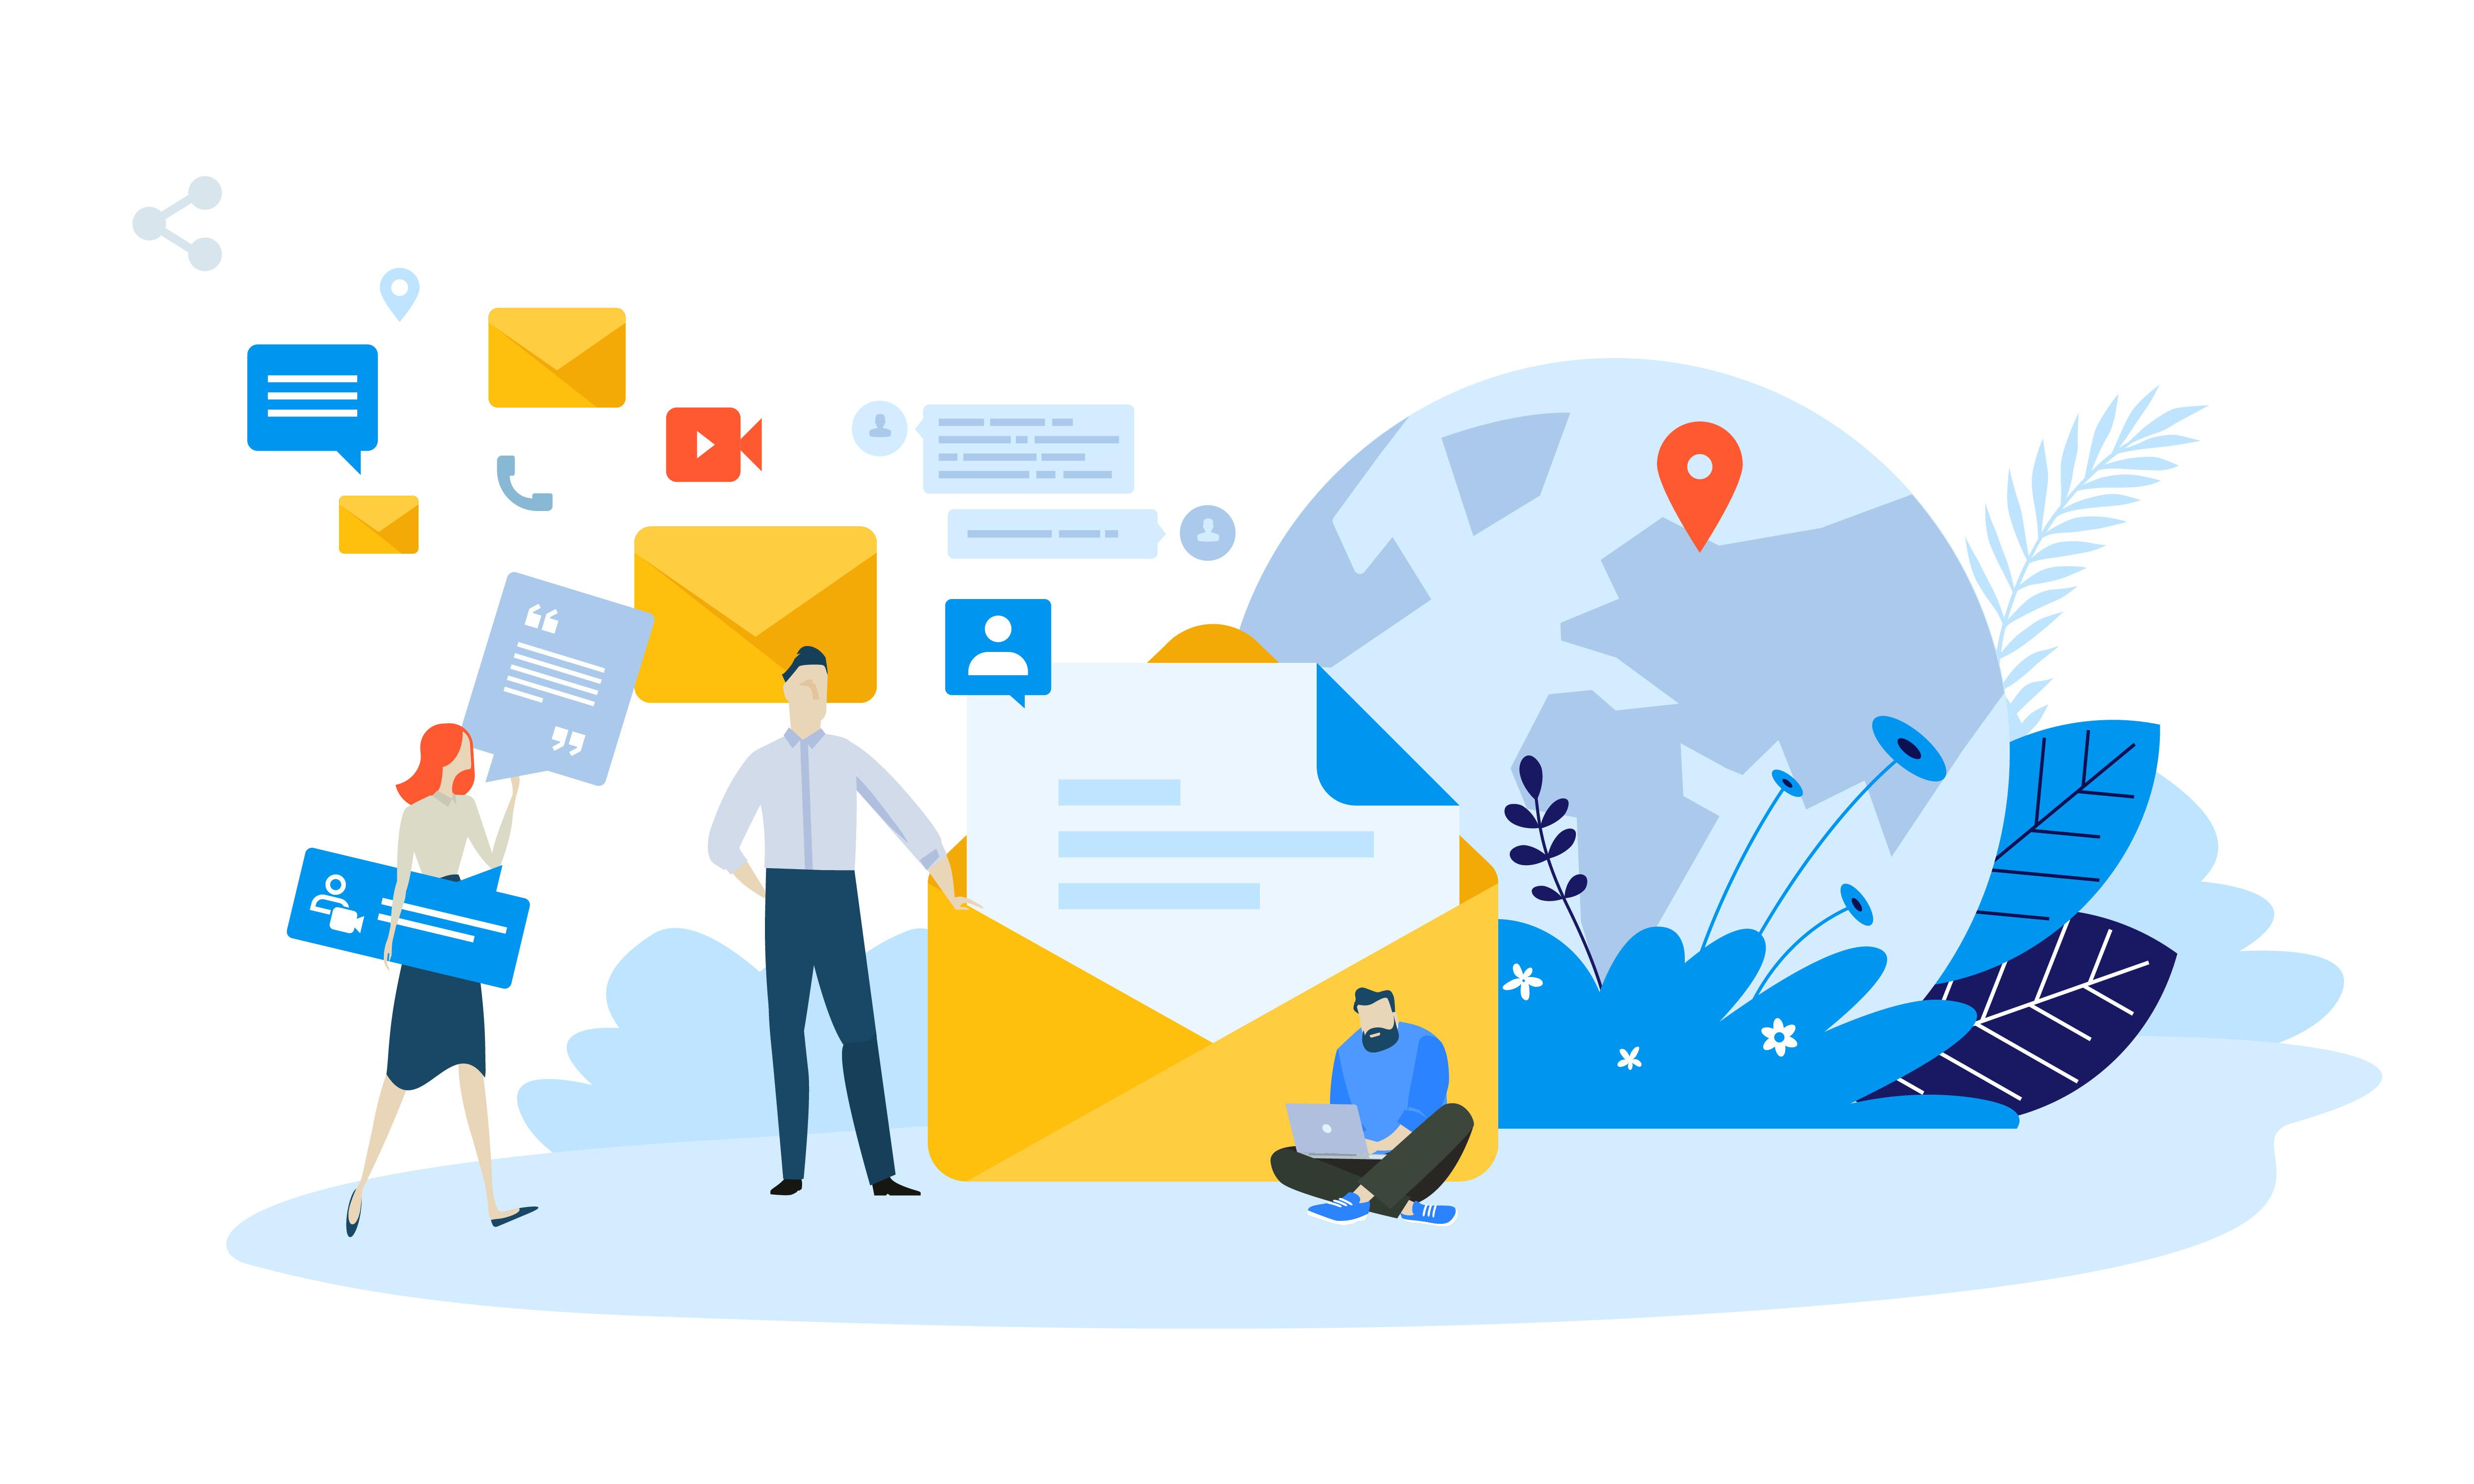 Vector illustration concept of email marketing. Creative flat design for web banner, marketing material, business presentation, online advertising.